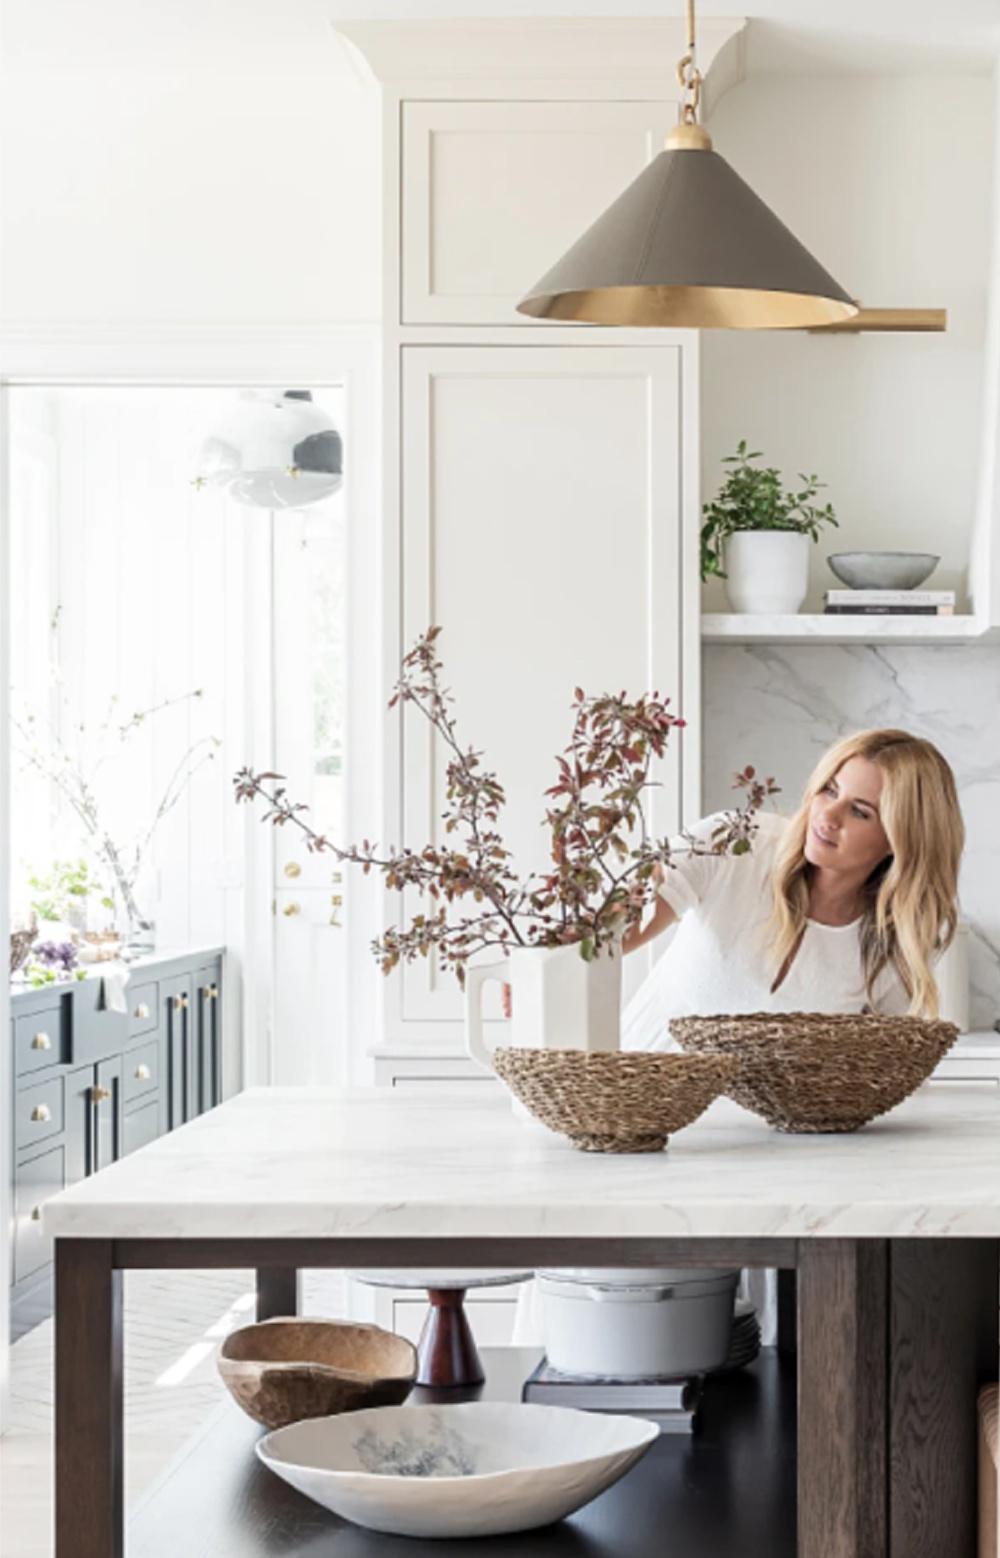 Beautiful classic modern farmhouse white kitchen island with wood open shelves beneath - McGee & Co. #whitekitchens #modernfarmhosue #serenekitchens